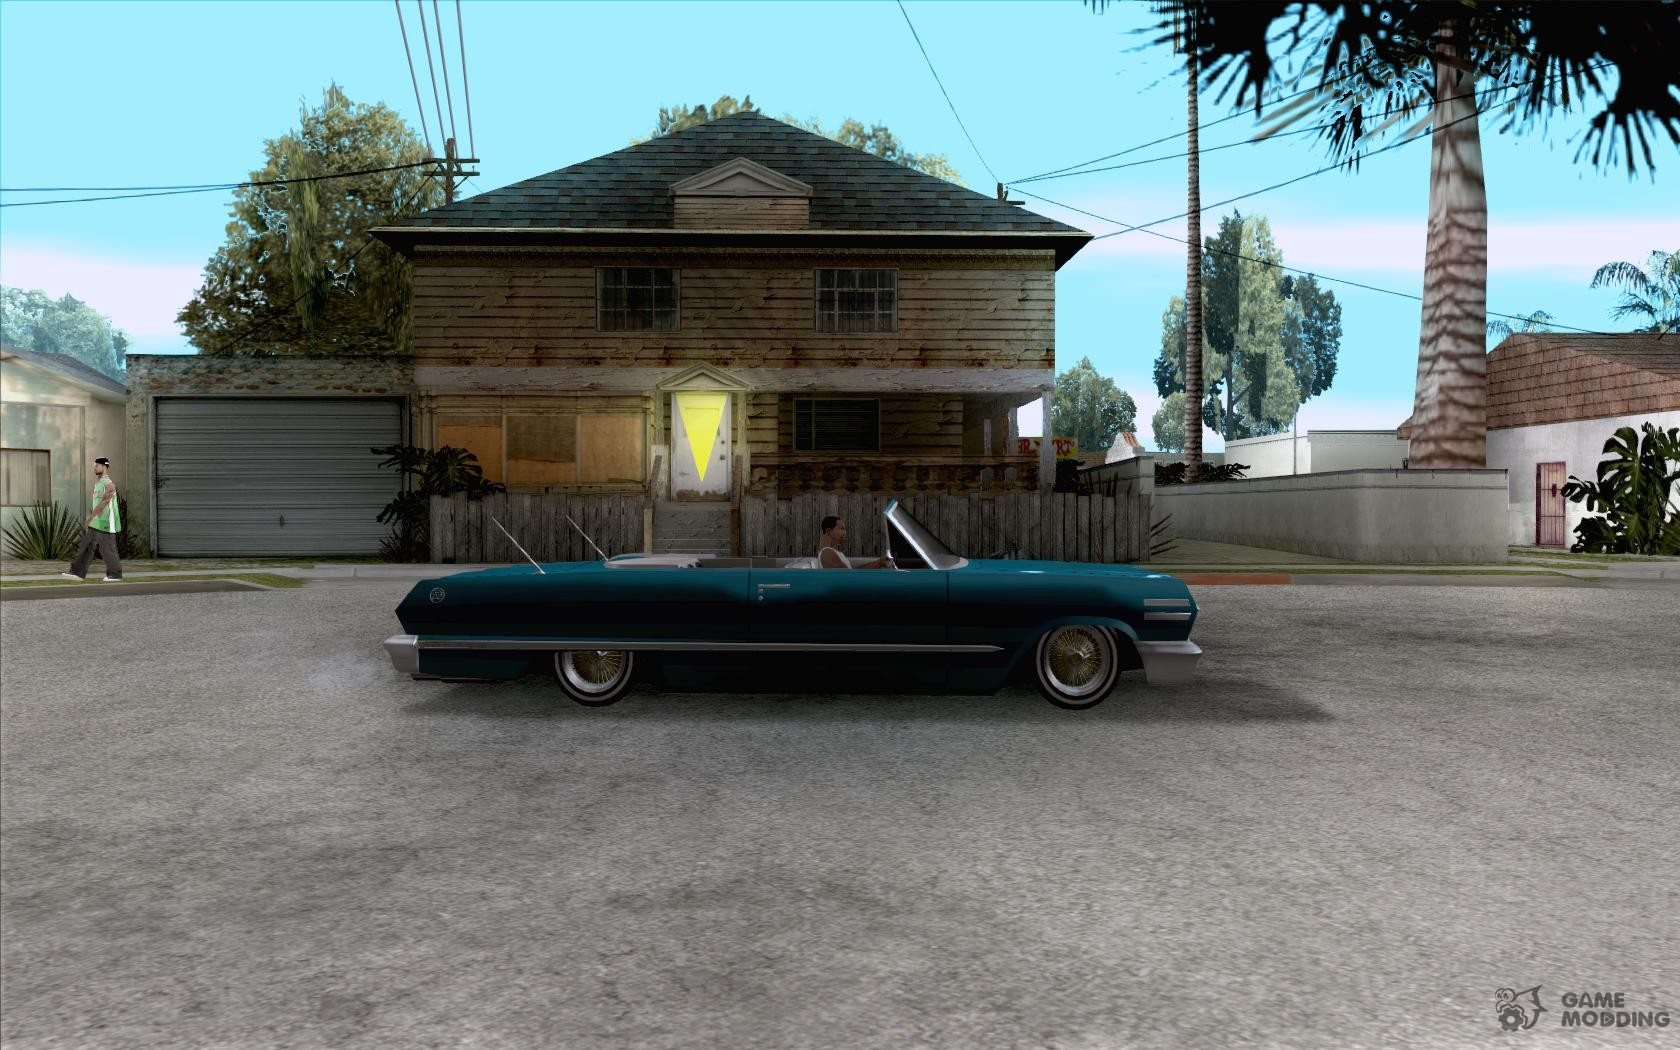 Chevrolet impala 4 door hardtop 1963 for gta san andreas - Chevrolet Impala Hardtop 1963 For Gta San Andreas Inside View